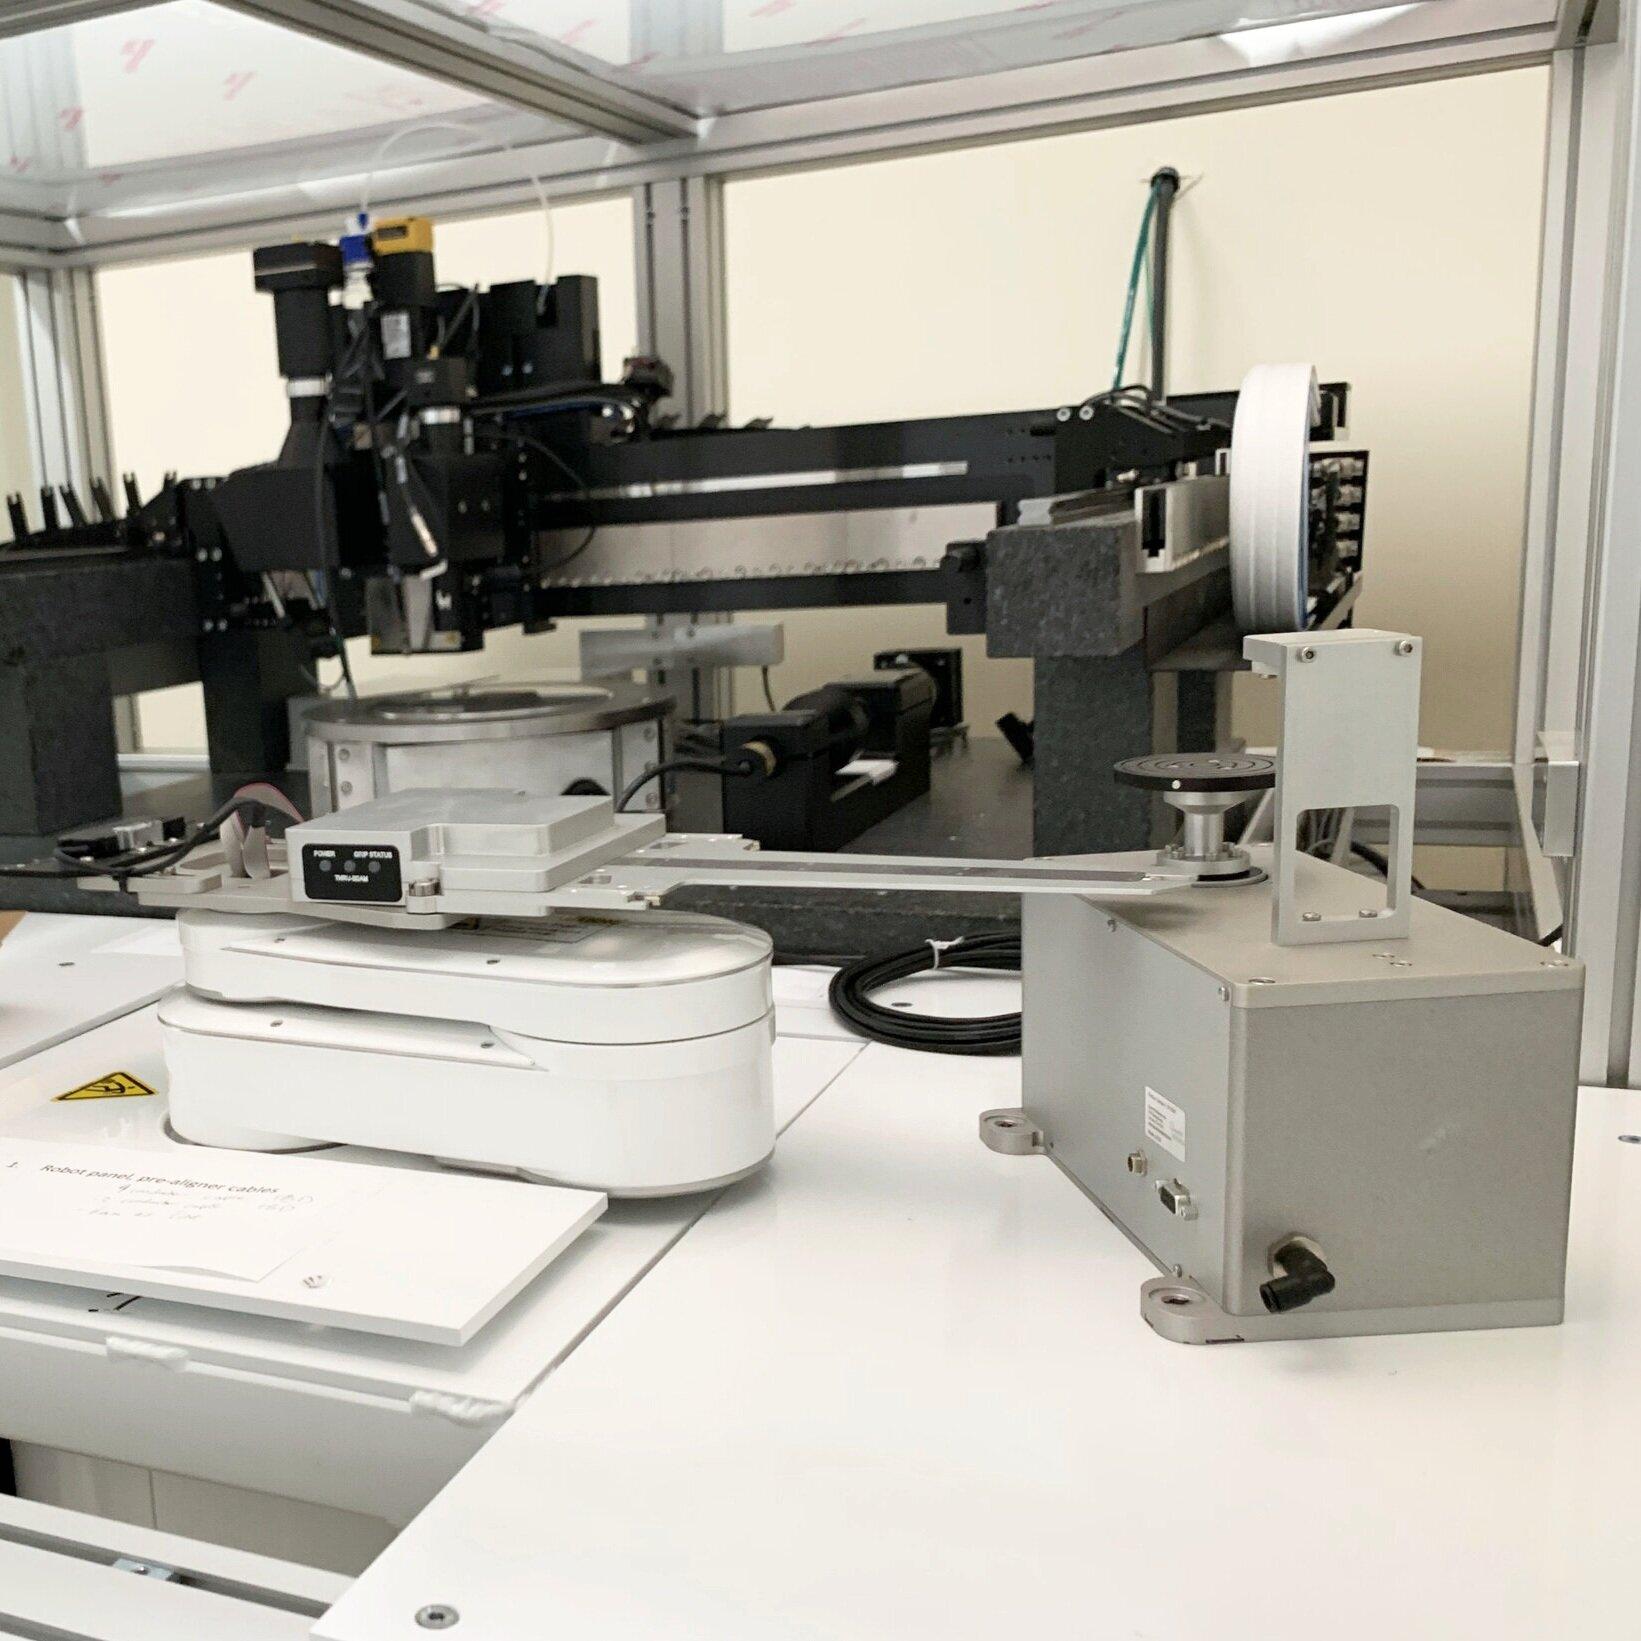 Process-Automation_chip-manufacturing-equipment_Fitz-Thors-Engineering_Birmingham-Alabama.jpg